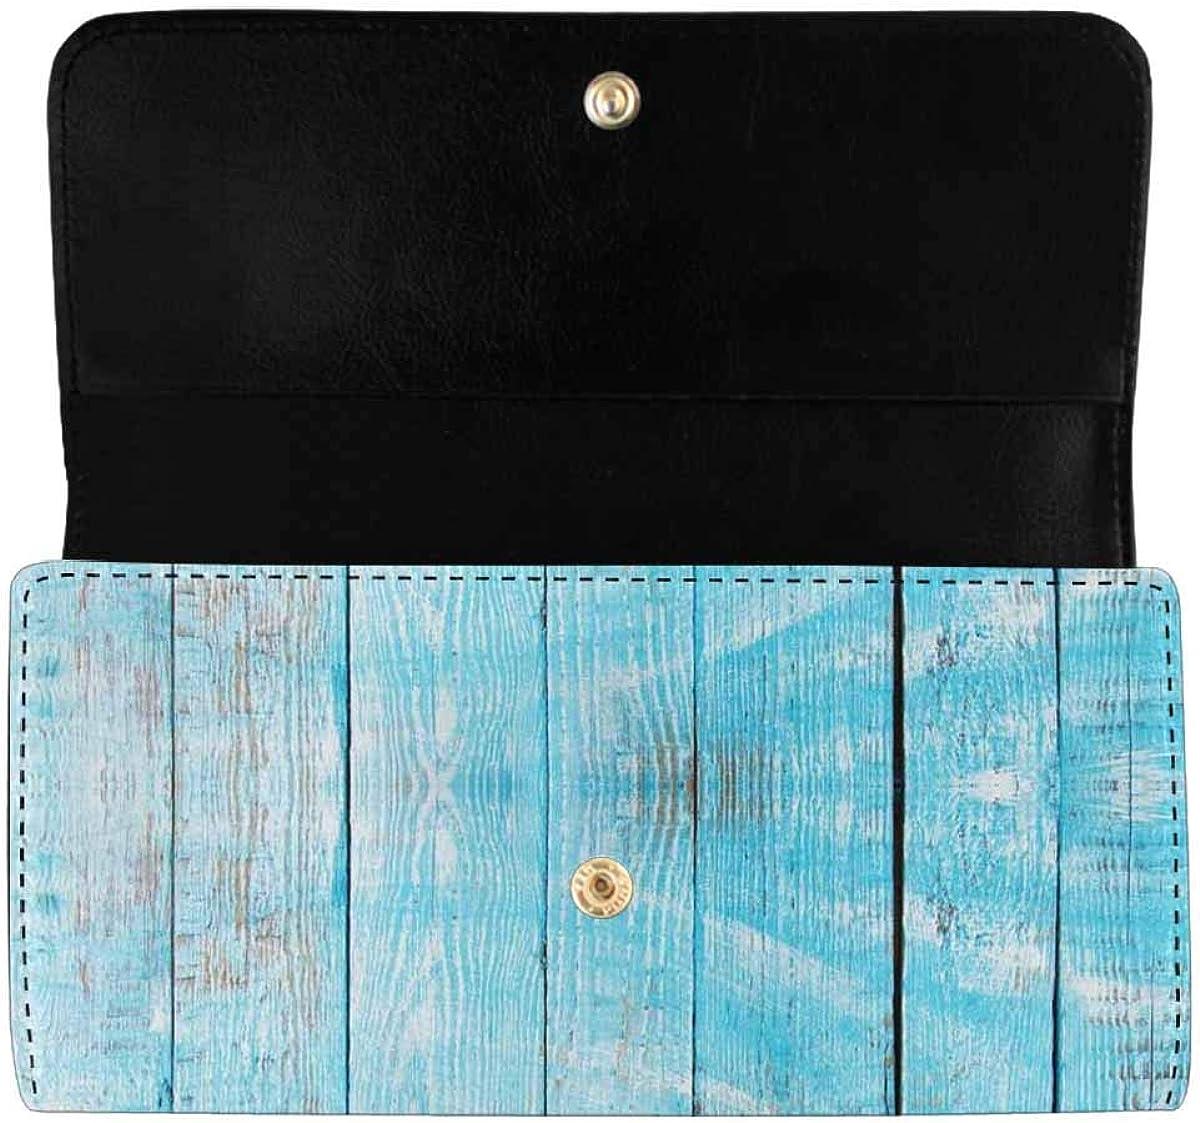 INTERESTPRINT Women's Long Clutch Wallets Pattern Santa Claus Trifold Card Holder Purses